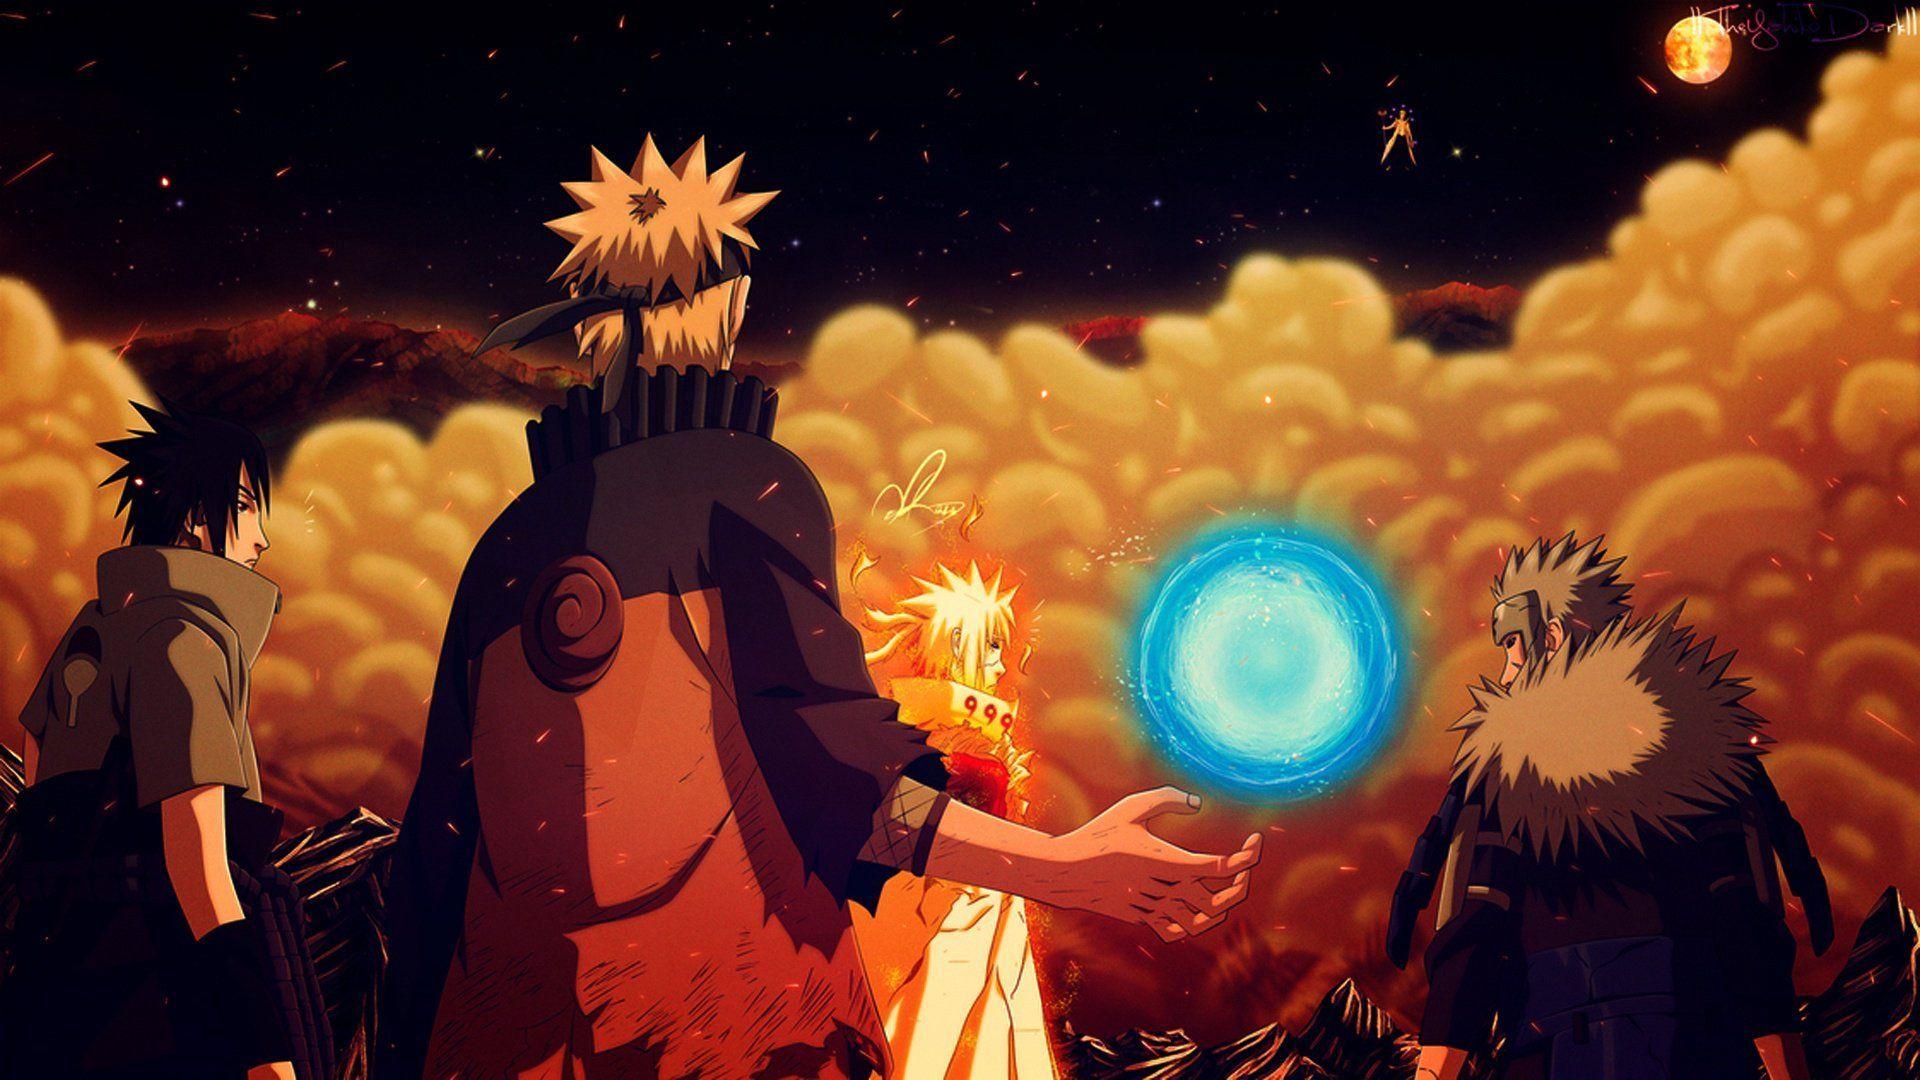 Minato From Naruto Wallpaper Engine Fresh 136 Minato Namikaze Papeis De Parede Hd Madara Uchiha Papel De Parede Anime Naruto Uzumaki